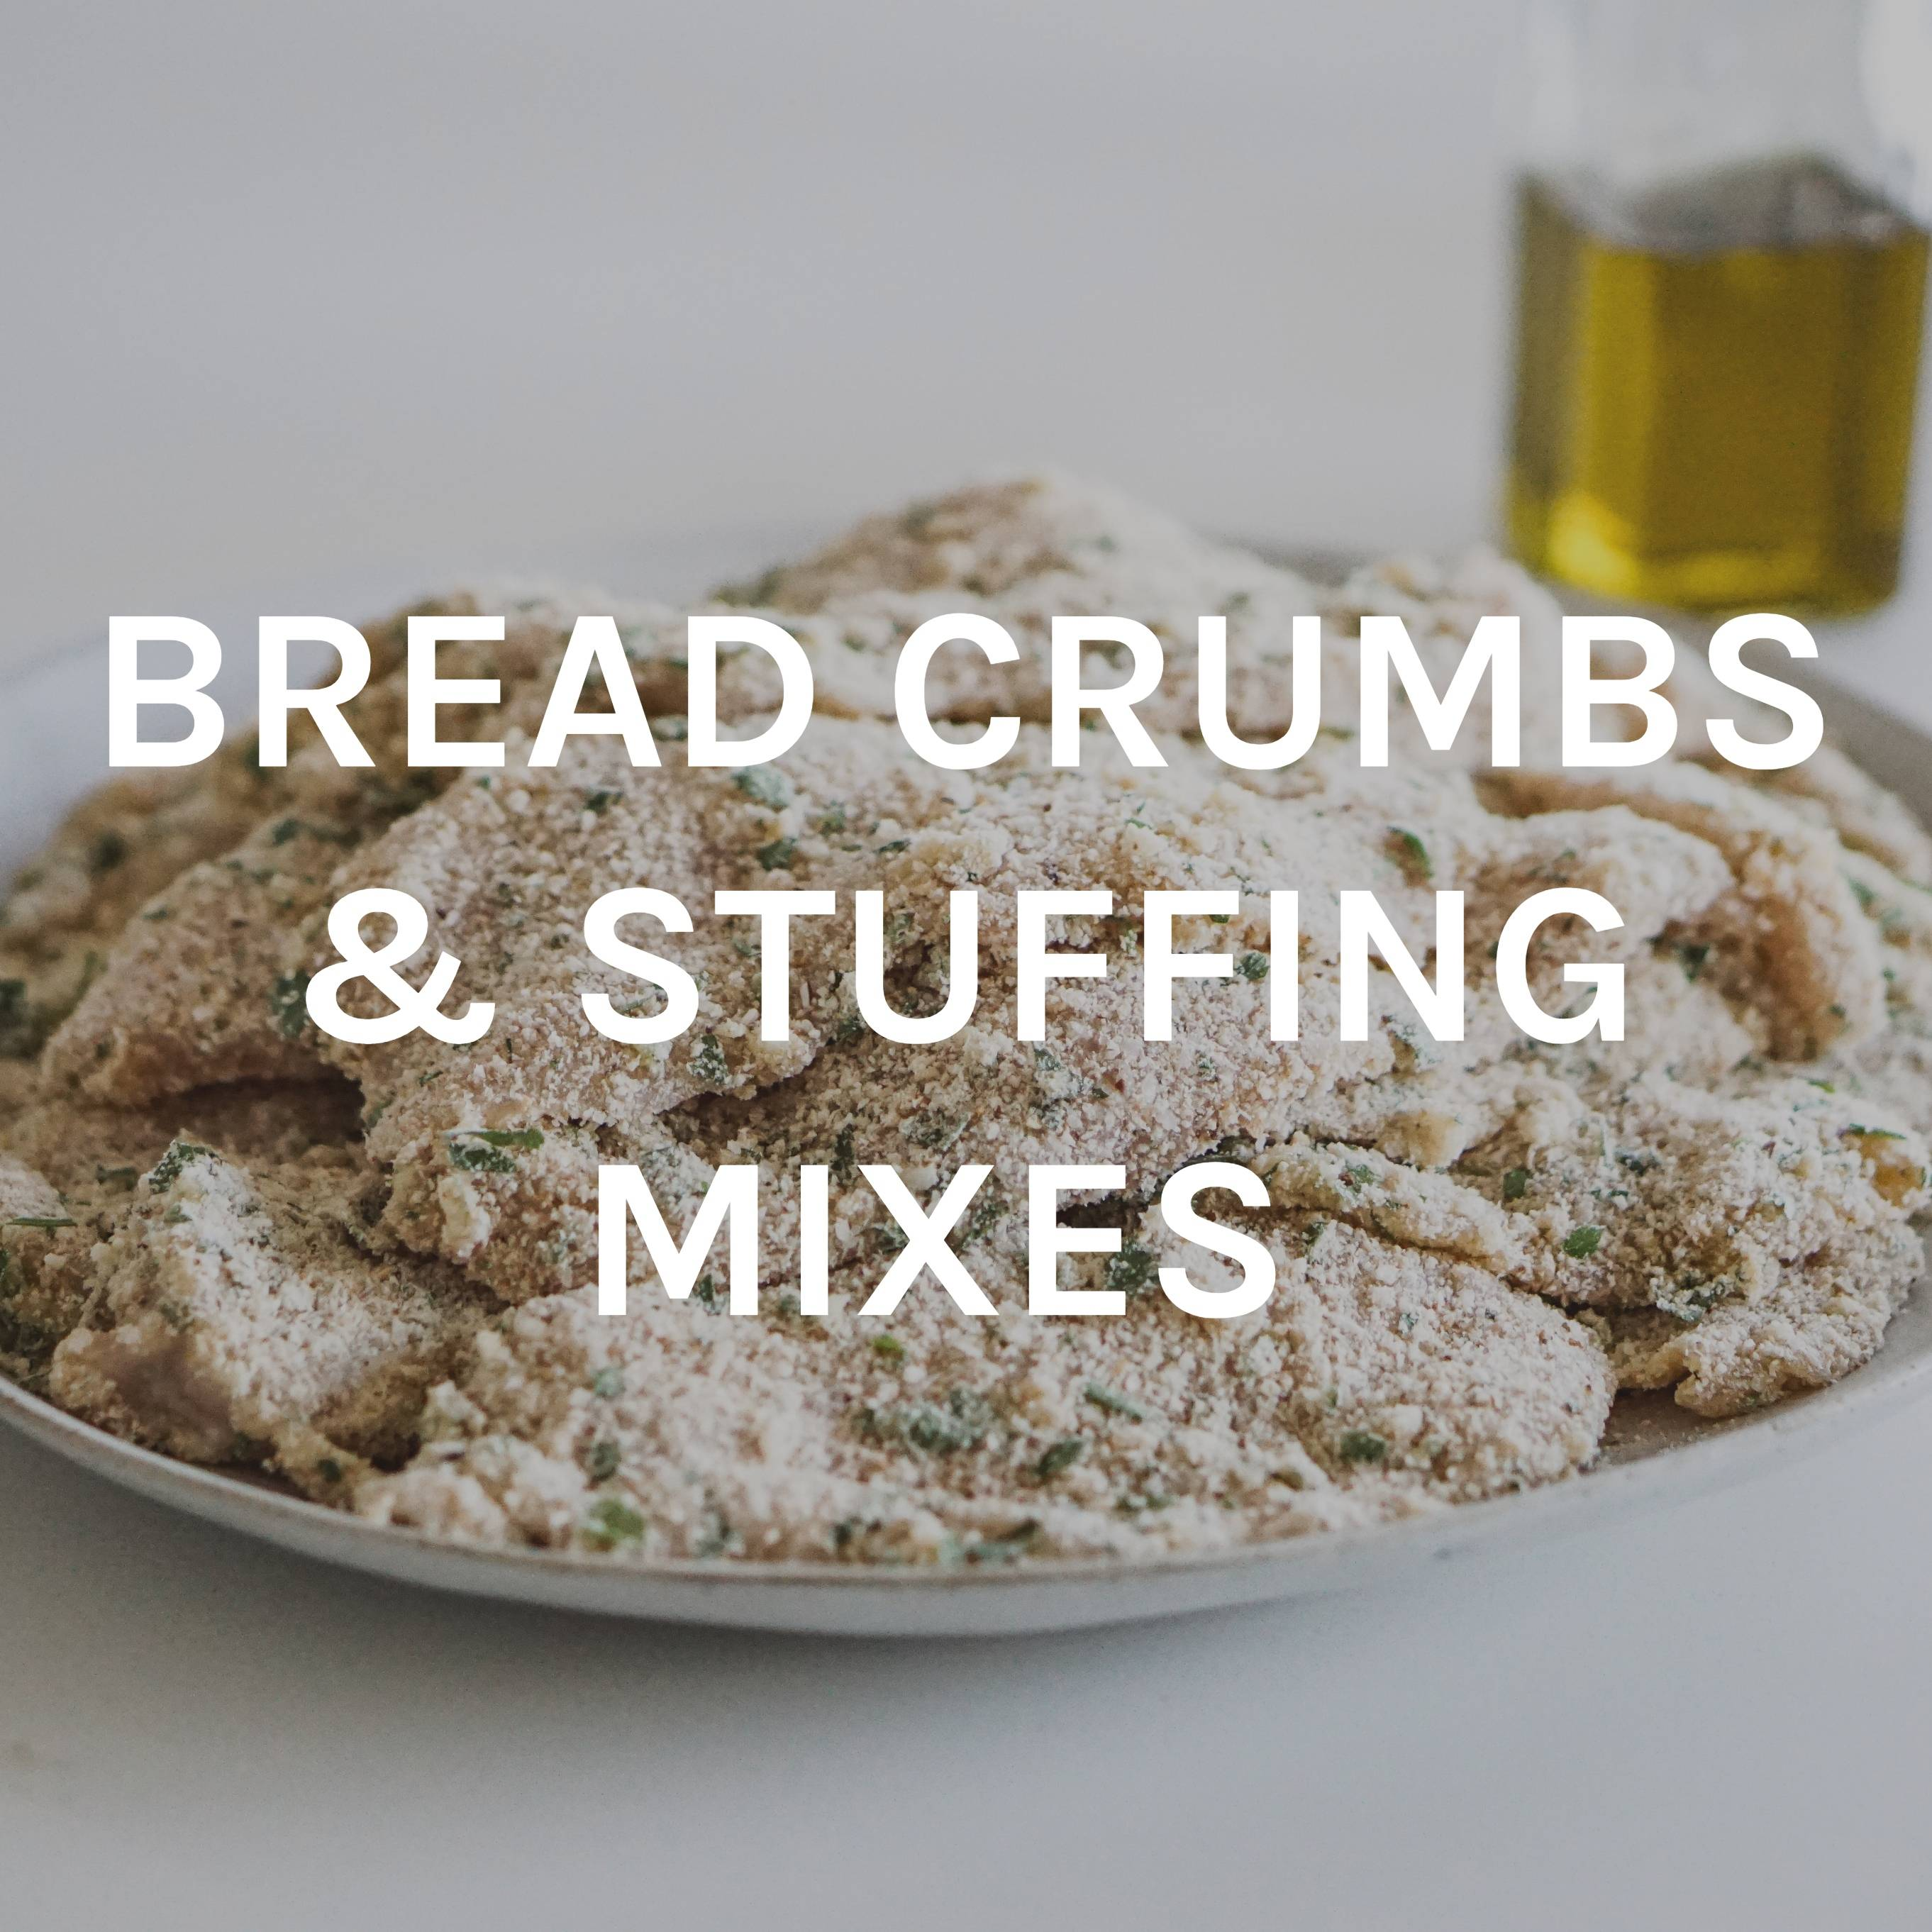 Bread Crumbs & Stuffing Mixes